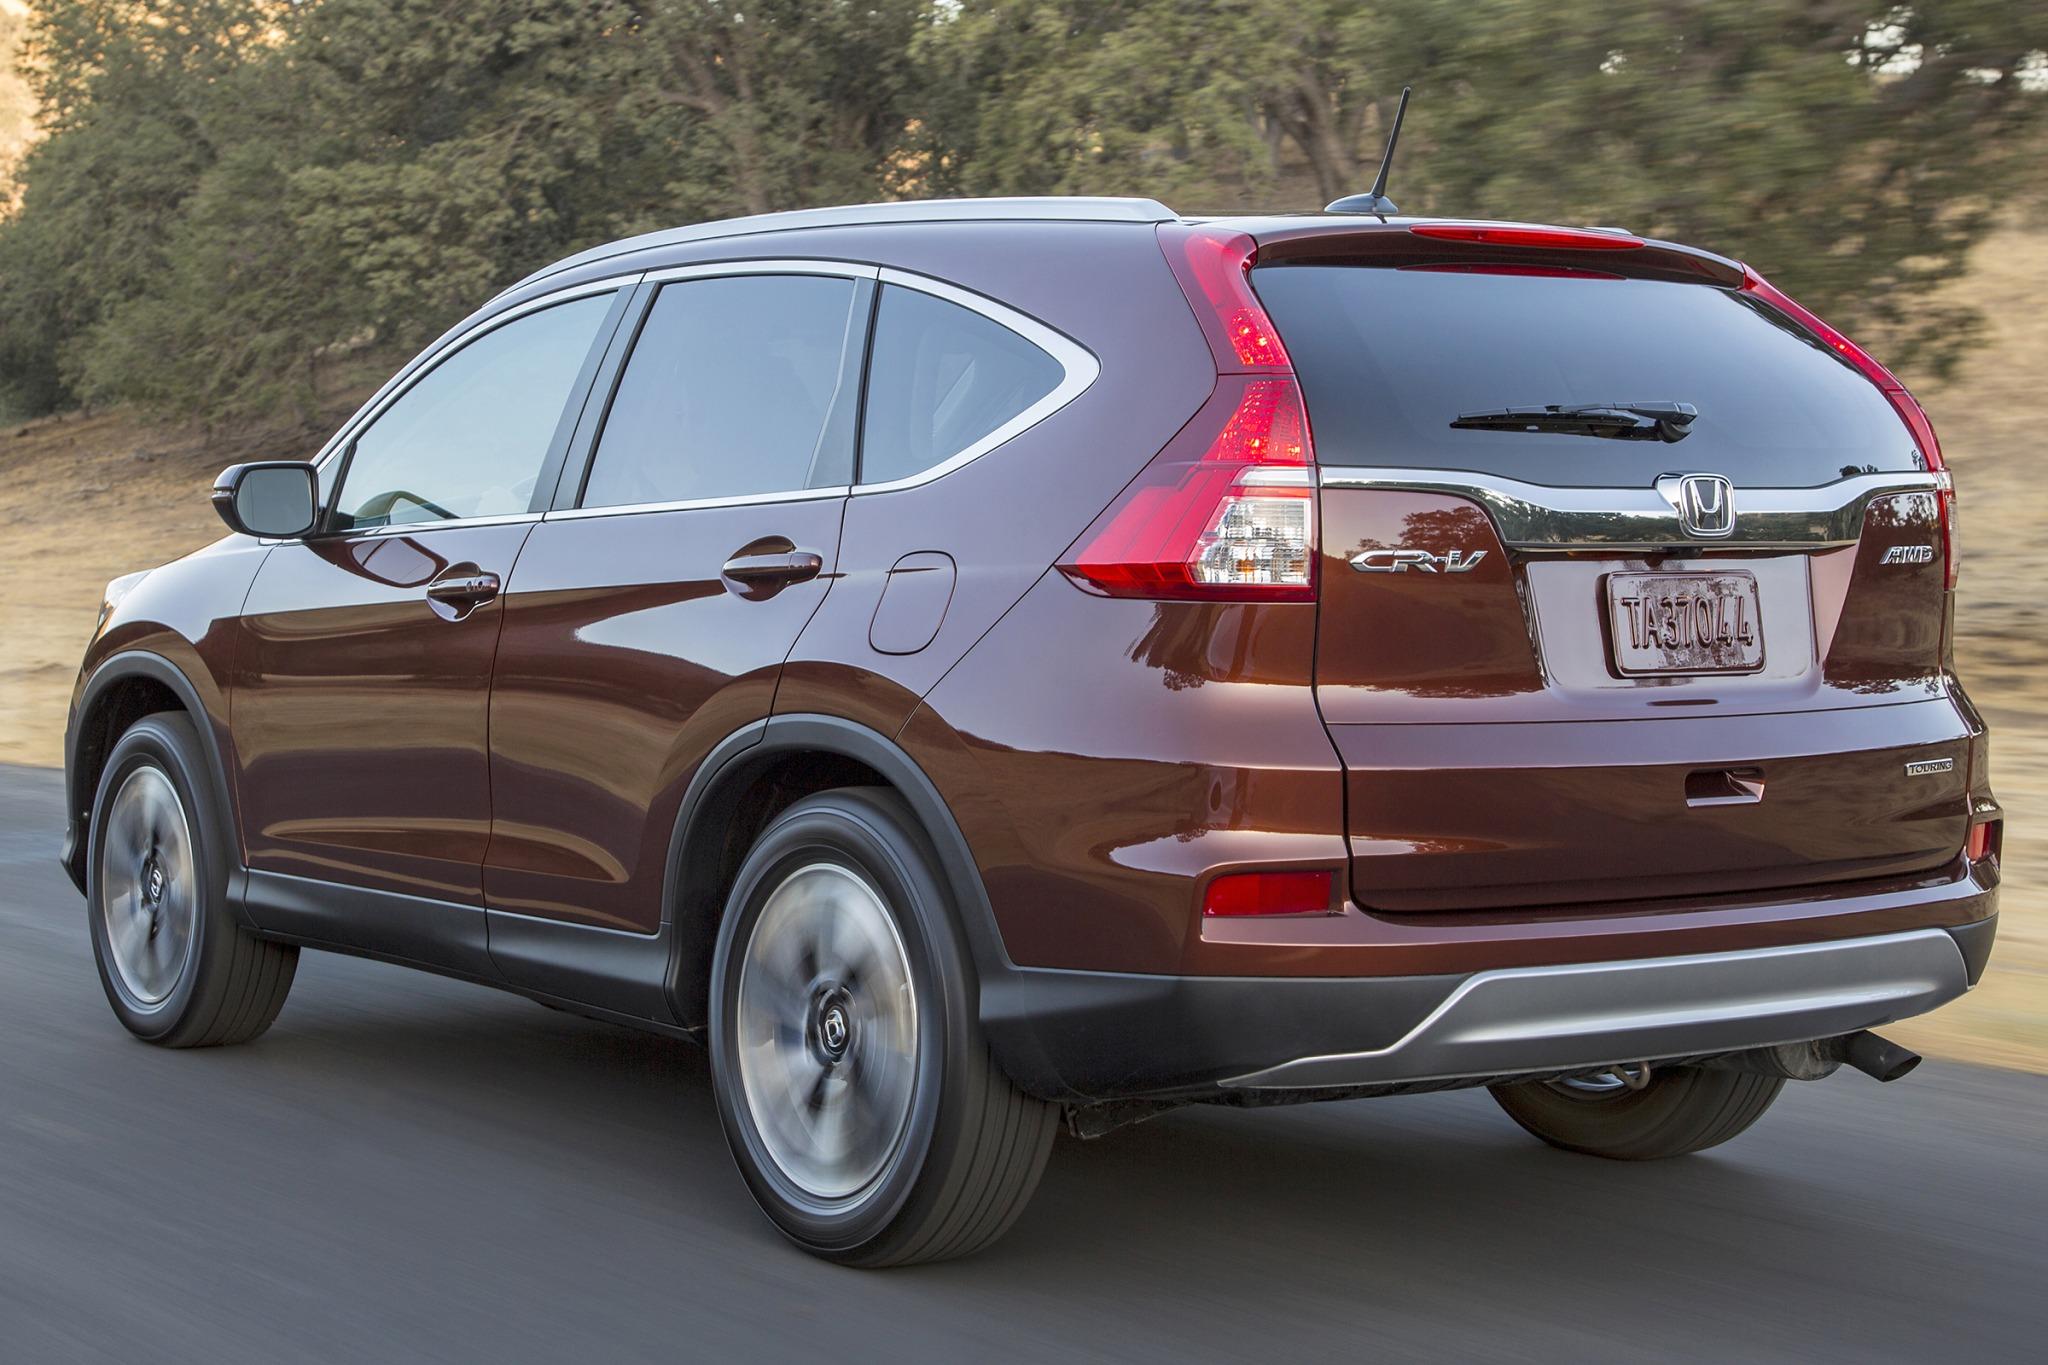 2016 Honda CR-V LX 2WD VIN Number Search - AutoDetective